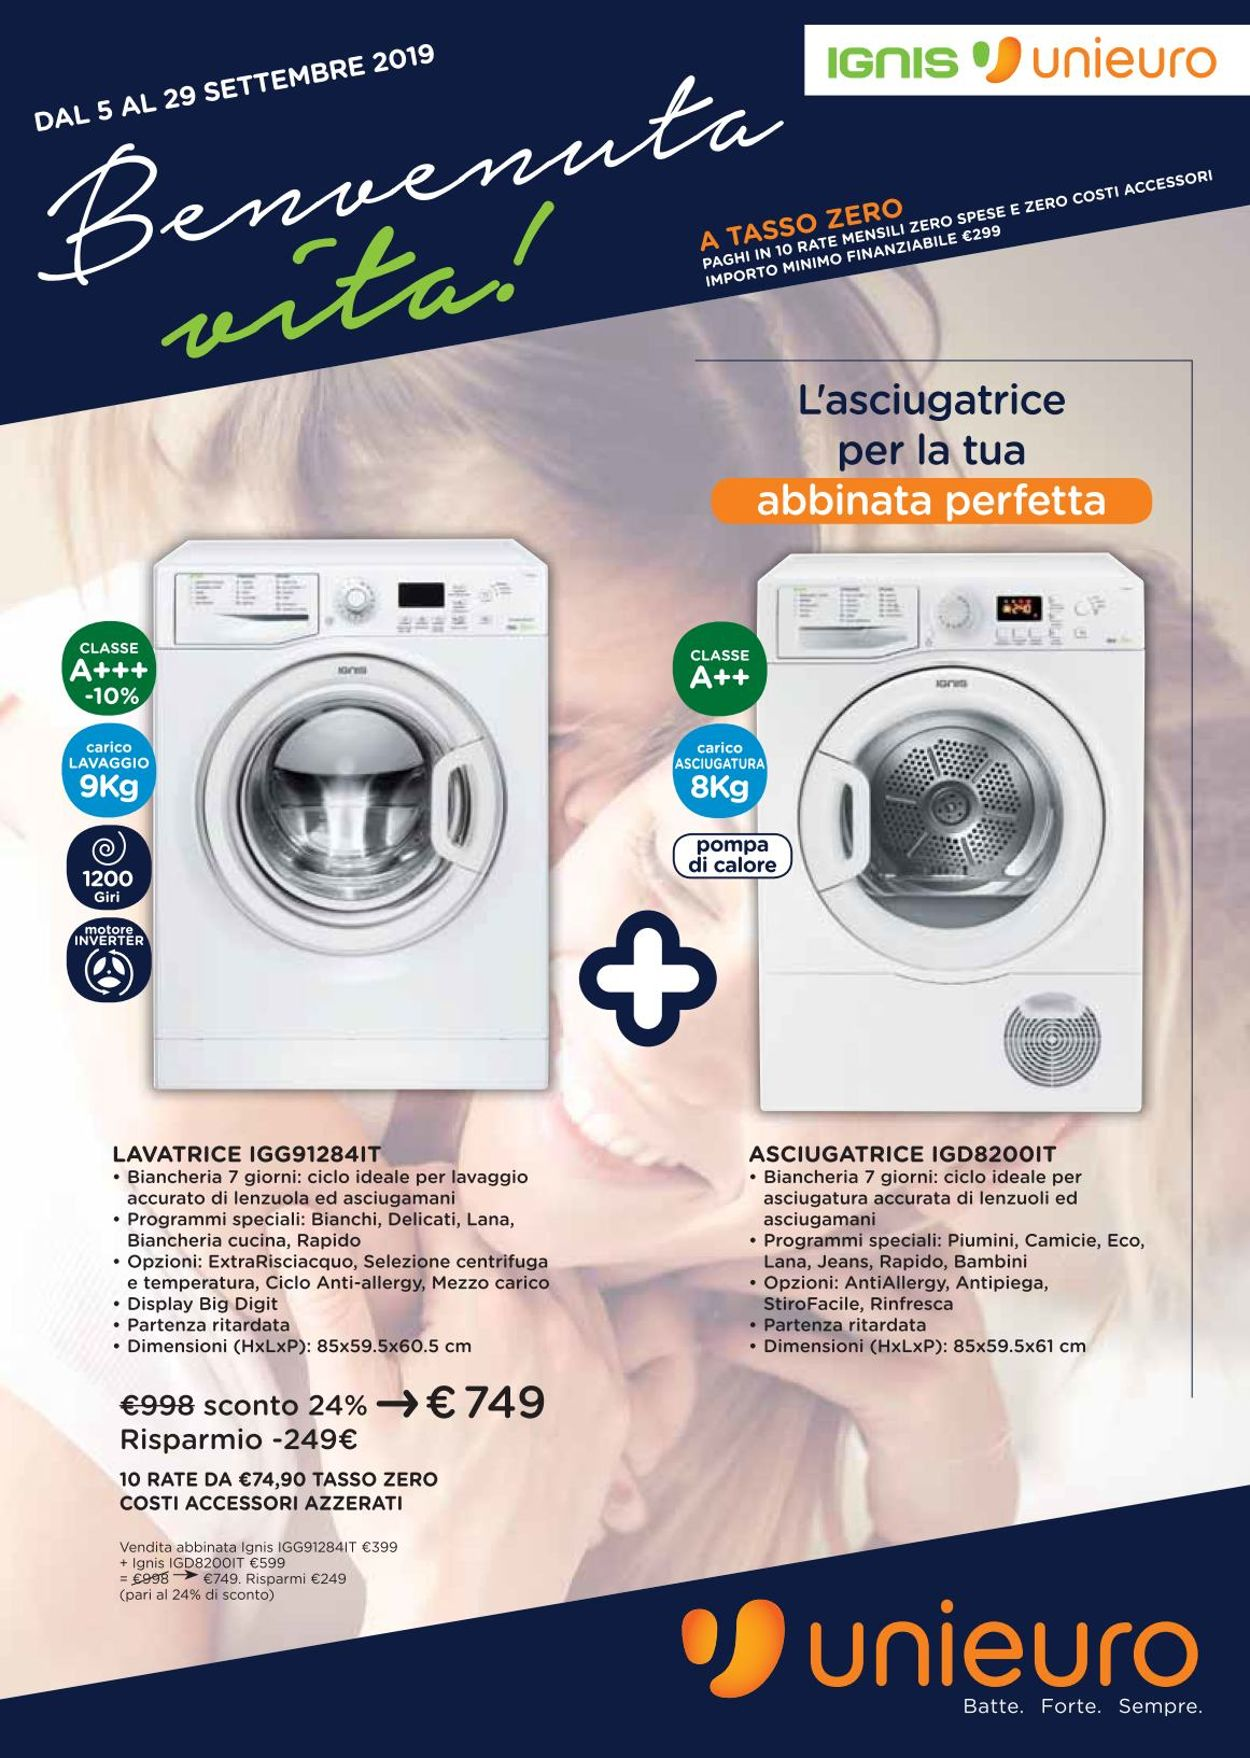 Volantino Unieuro - Offerte 05/09-29/09/2019